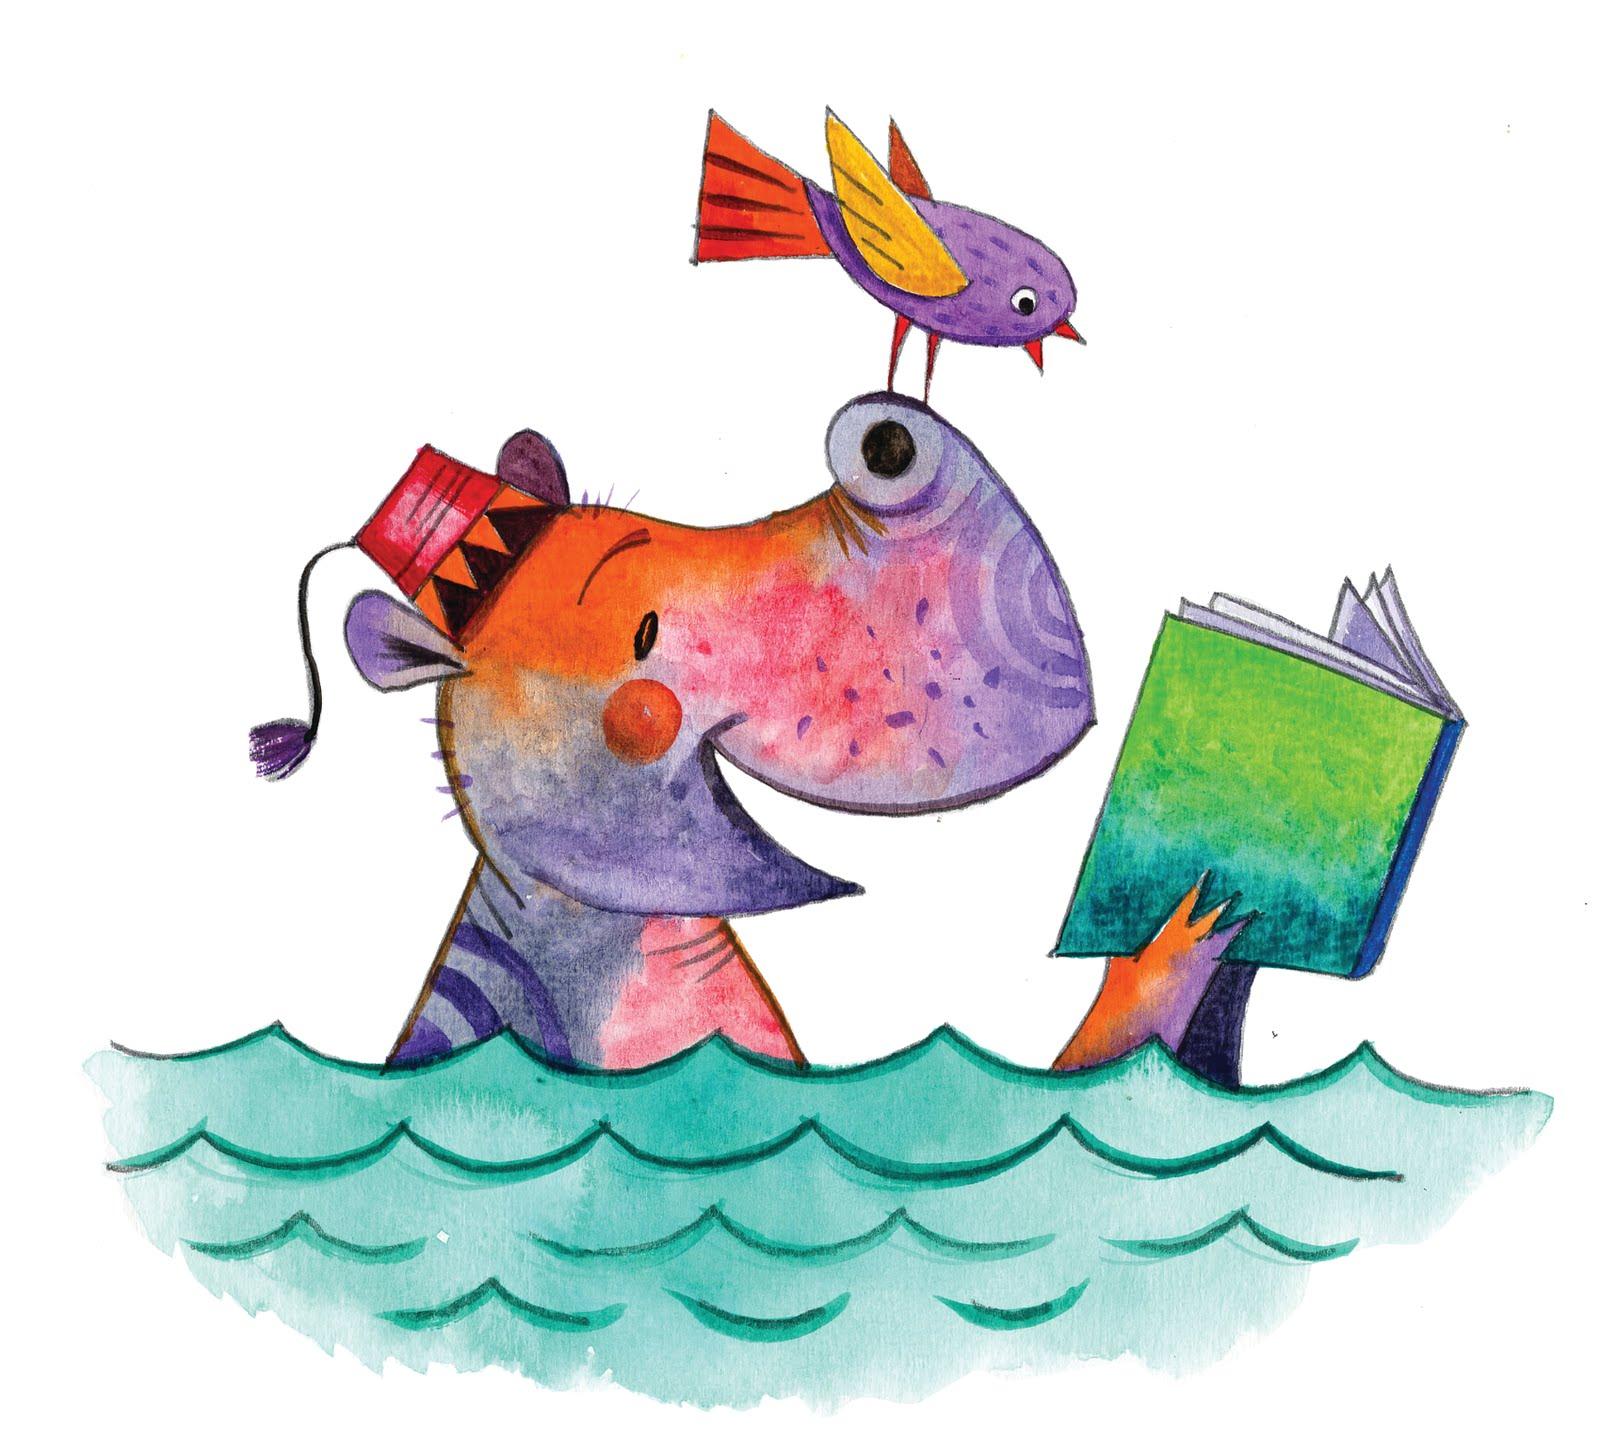 check it out flathead county library system summer reading program rh flatheadcountylibrary blogspot com summer reading clipart 2017 summer reading clip art 2018